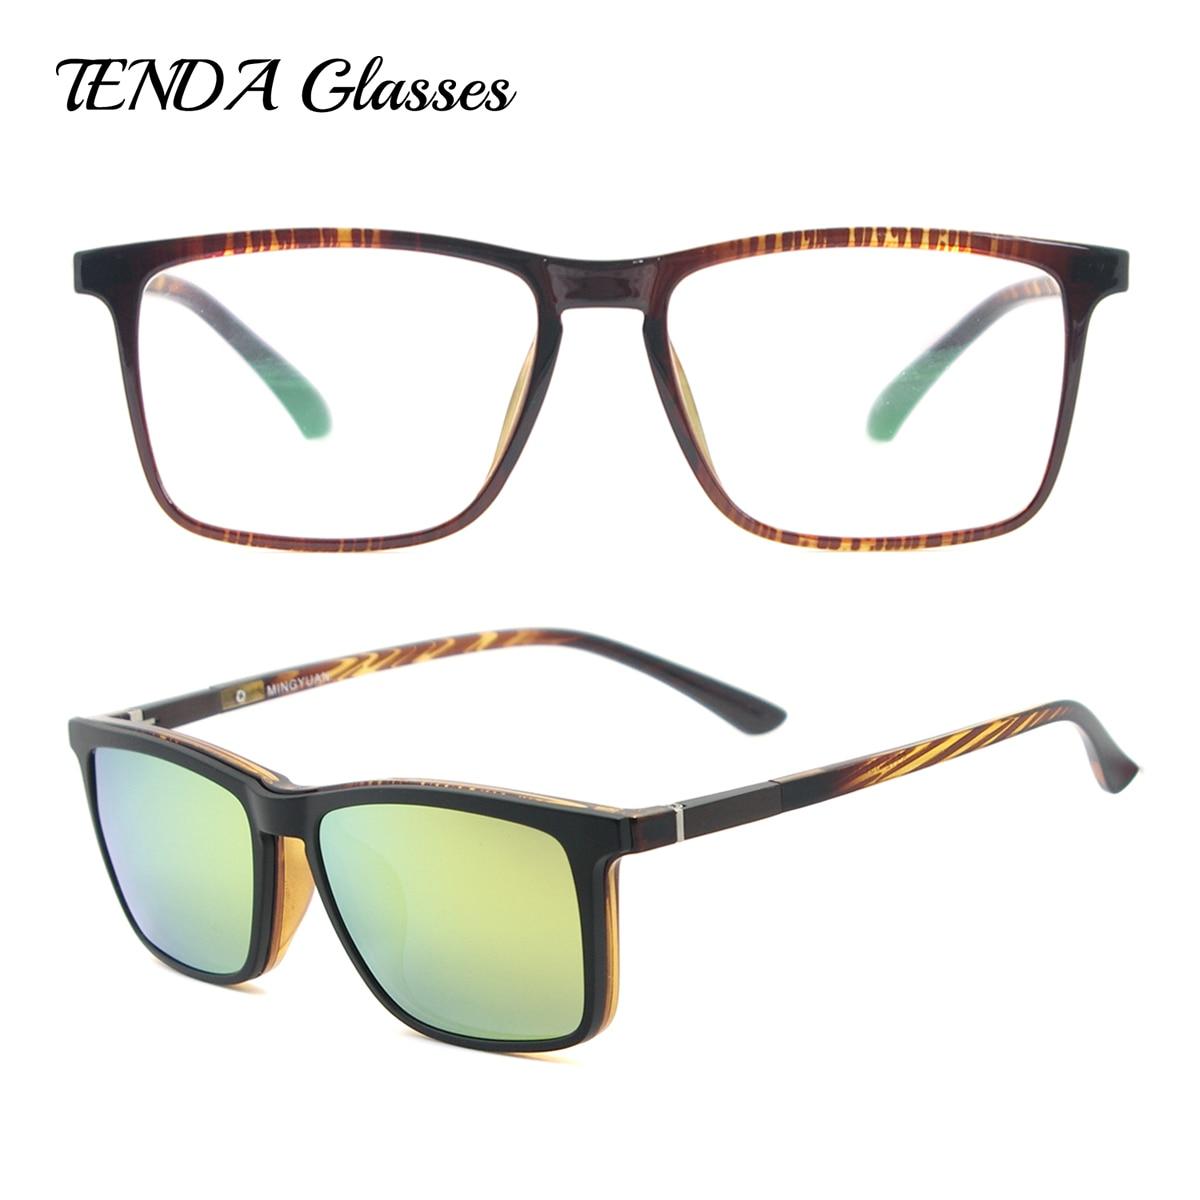 56bab7a476 Hombres cuadrados Clip polarizado gafas de sol de moda Flexible ligera TR90  Vintage gafas de grado lentes